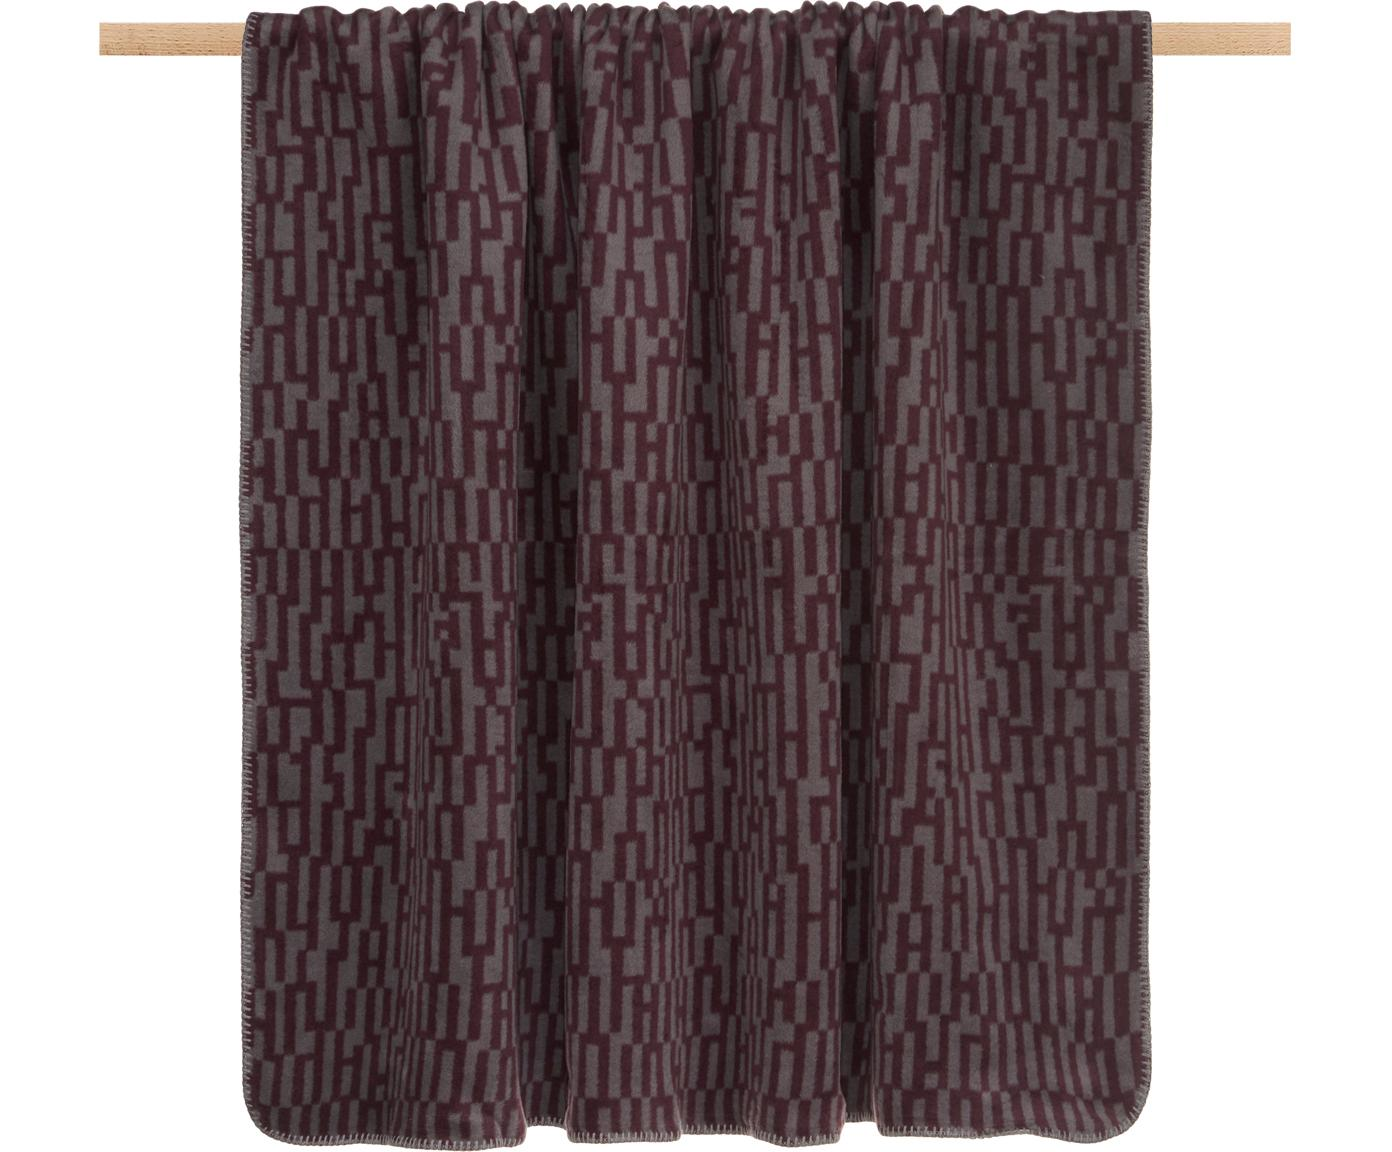 Plaid Abstract, 50%Baumwolle, 43%Polyacryl (Dralon®), 7%Polyester, Violett, Grau, 150 x 200 cm